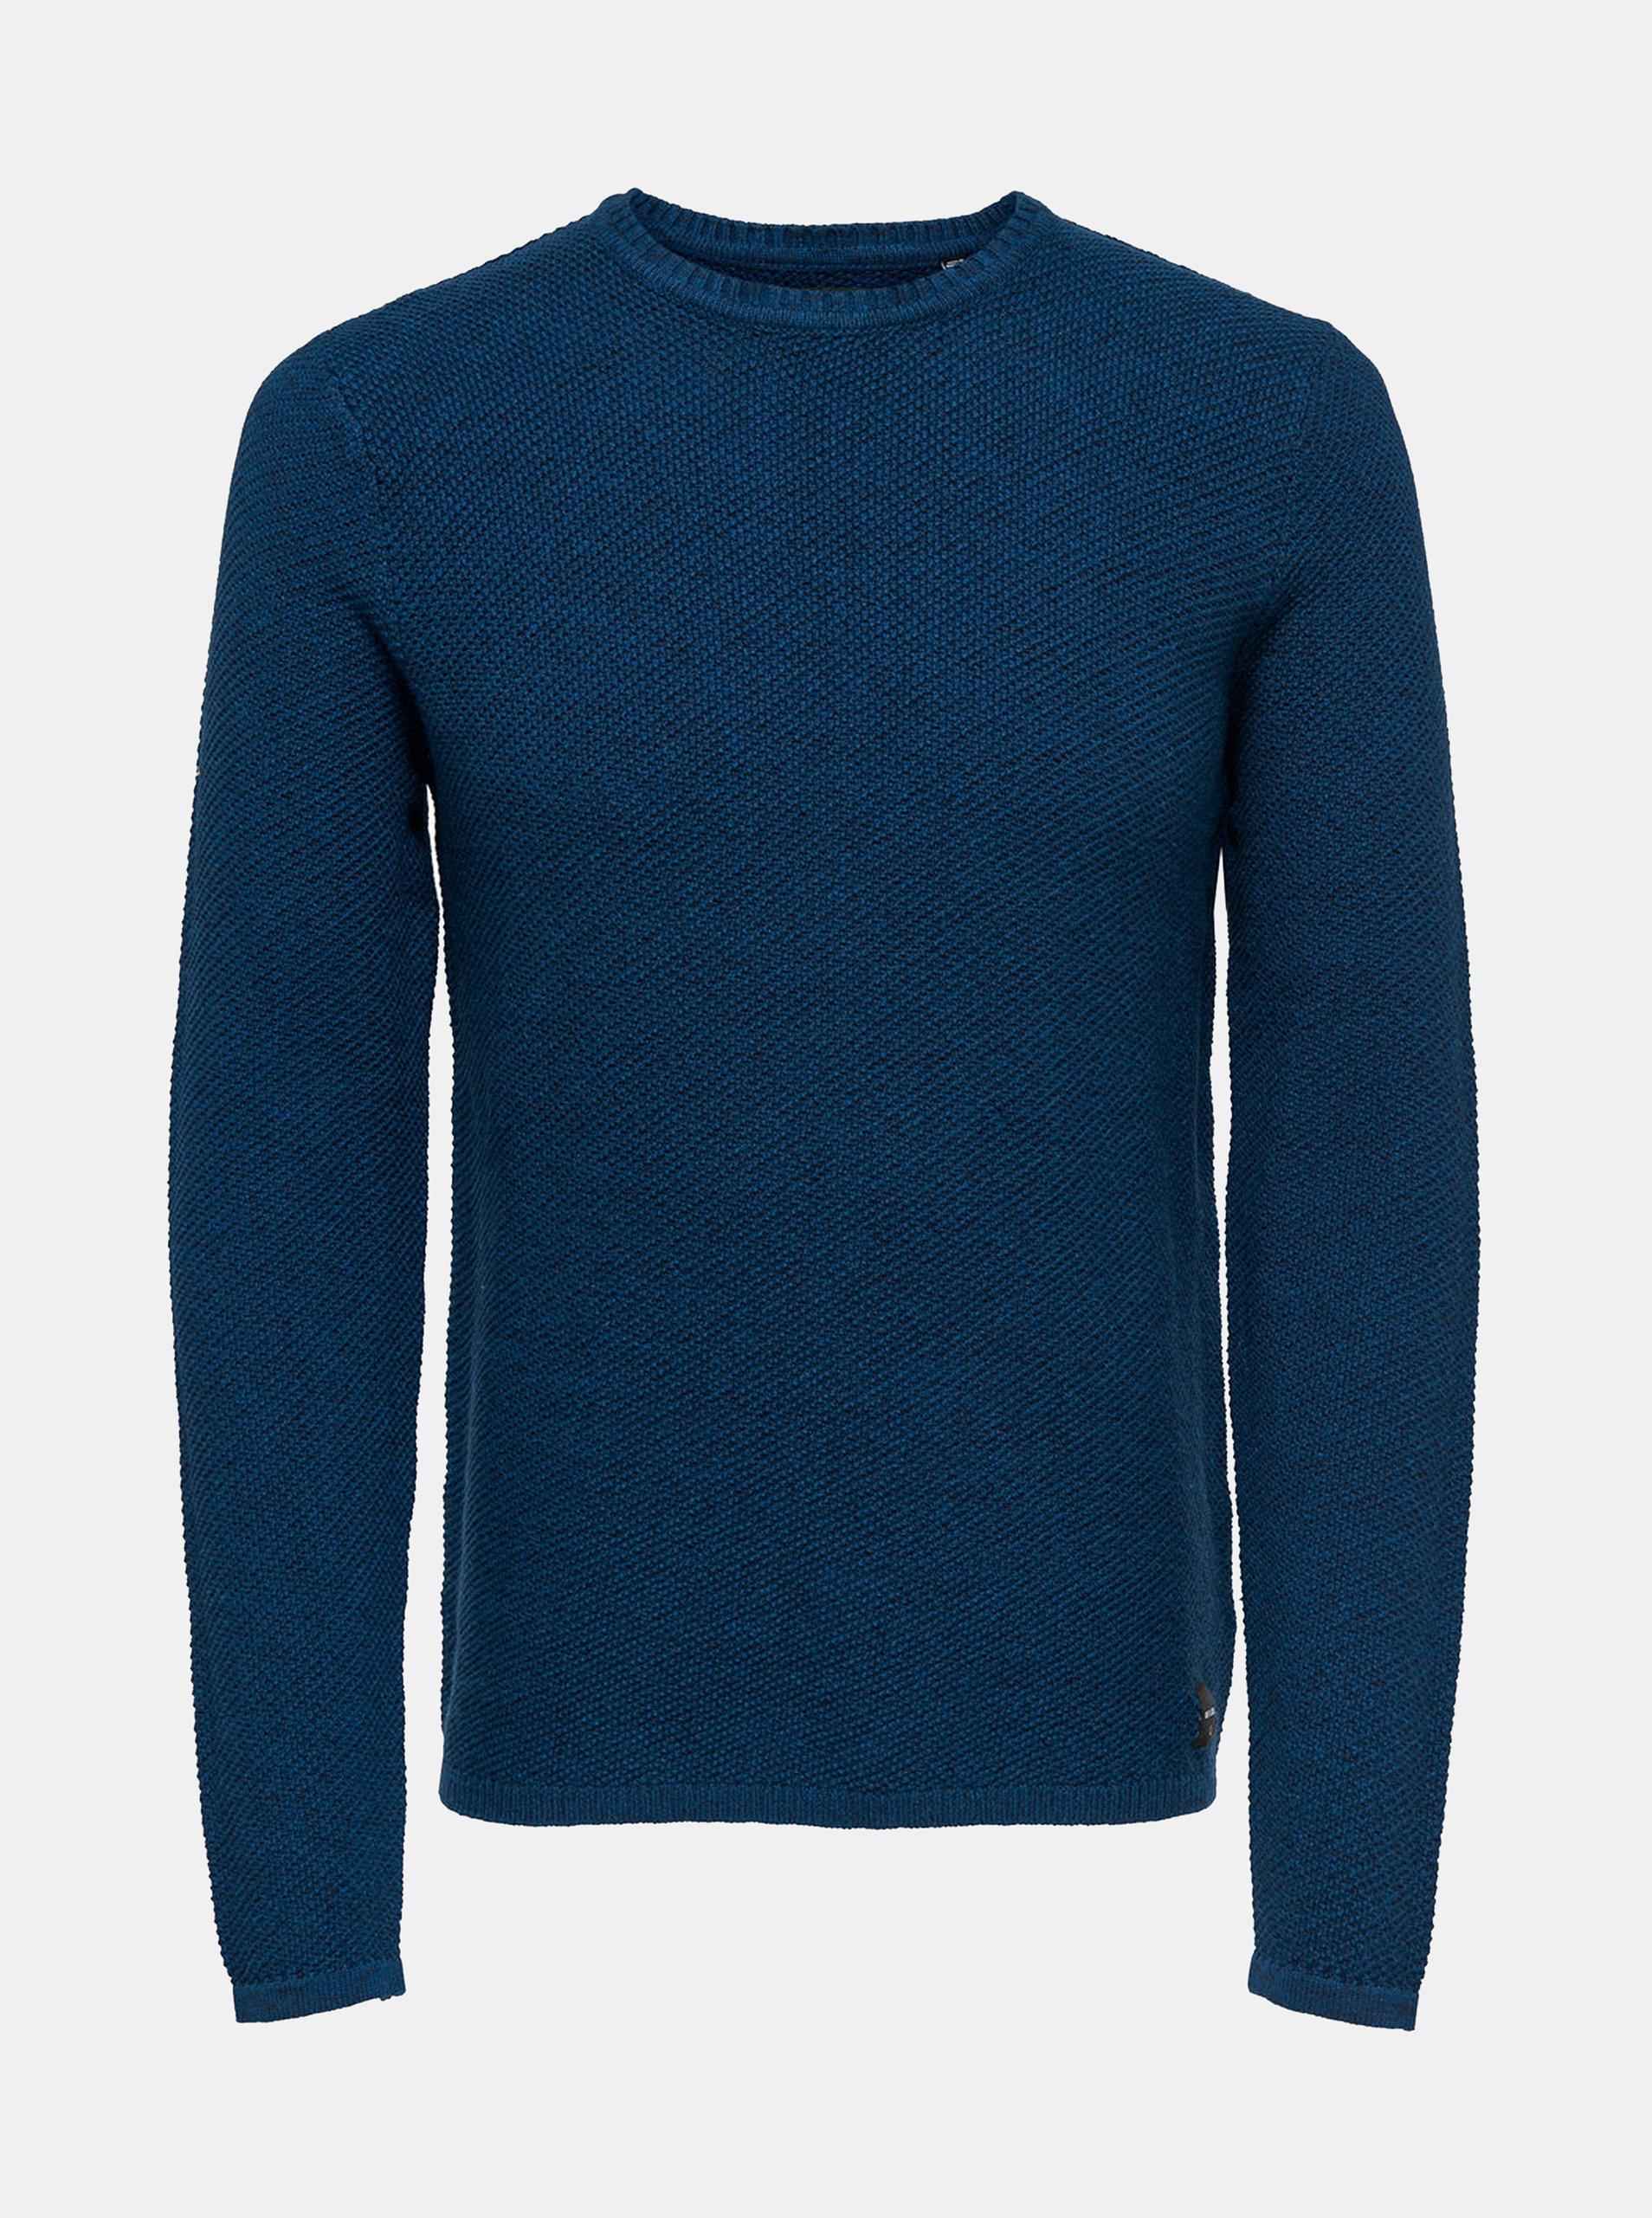 Modrý svetr ONLY & SONS Dan 7